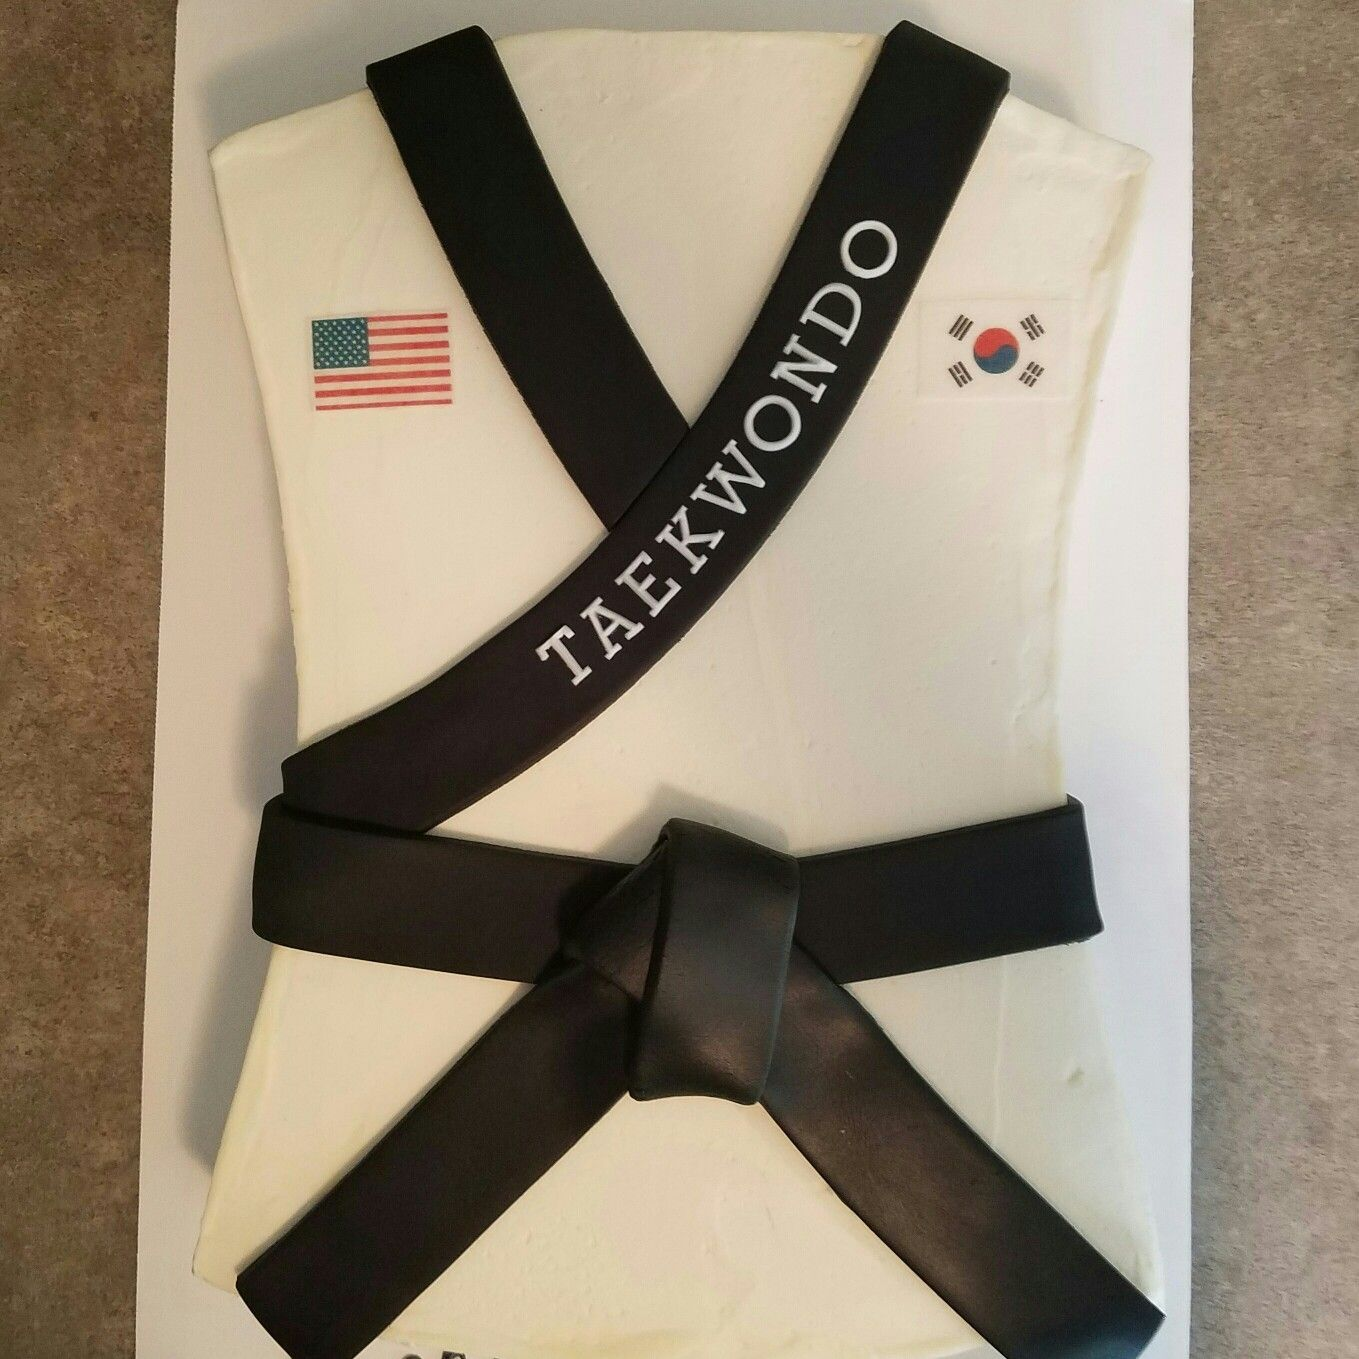 Taekwondo Black Belt Cake Like Us On Facebook At Gearhart Custom